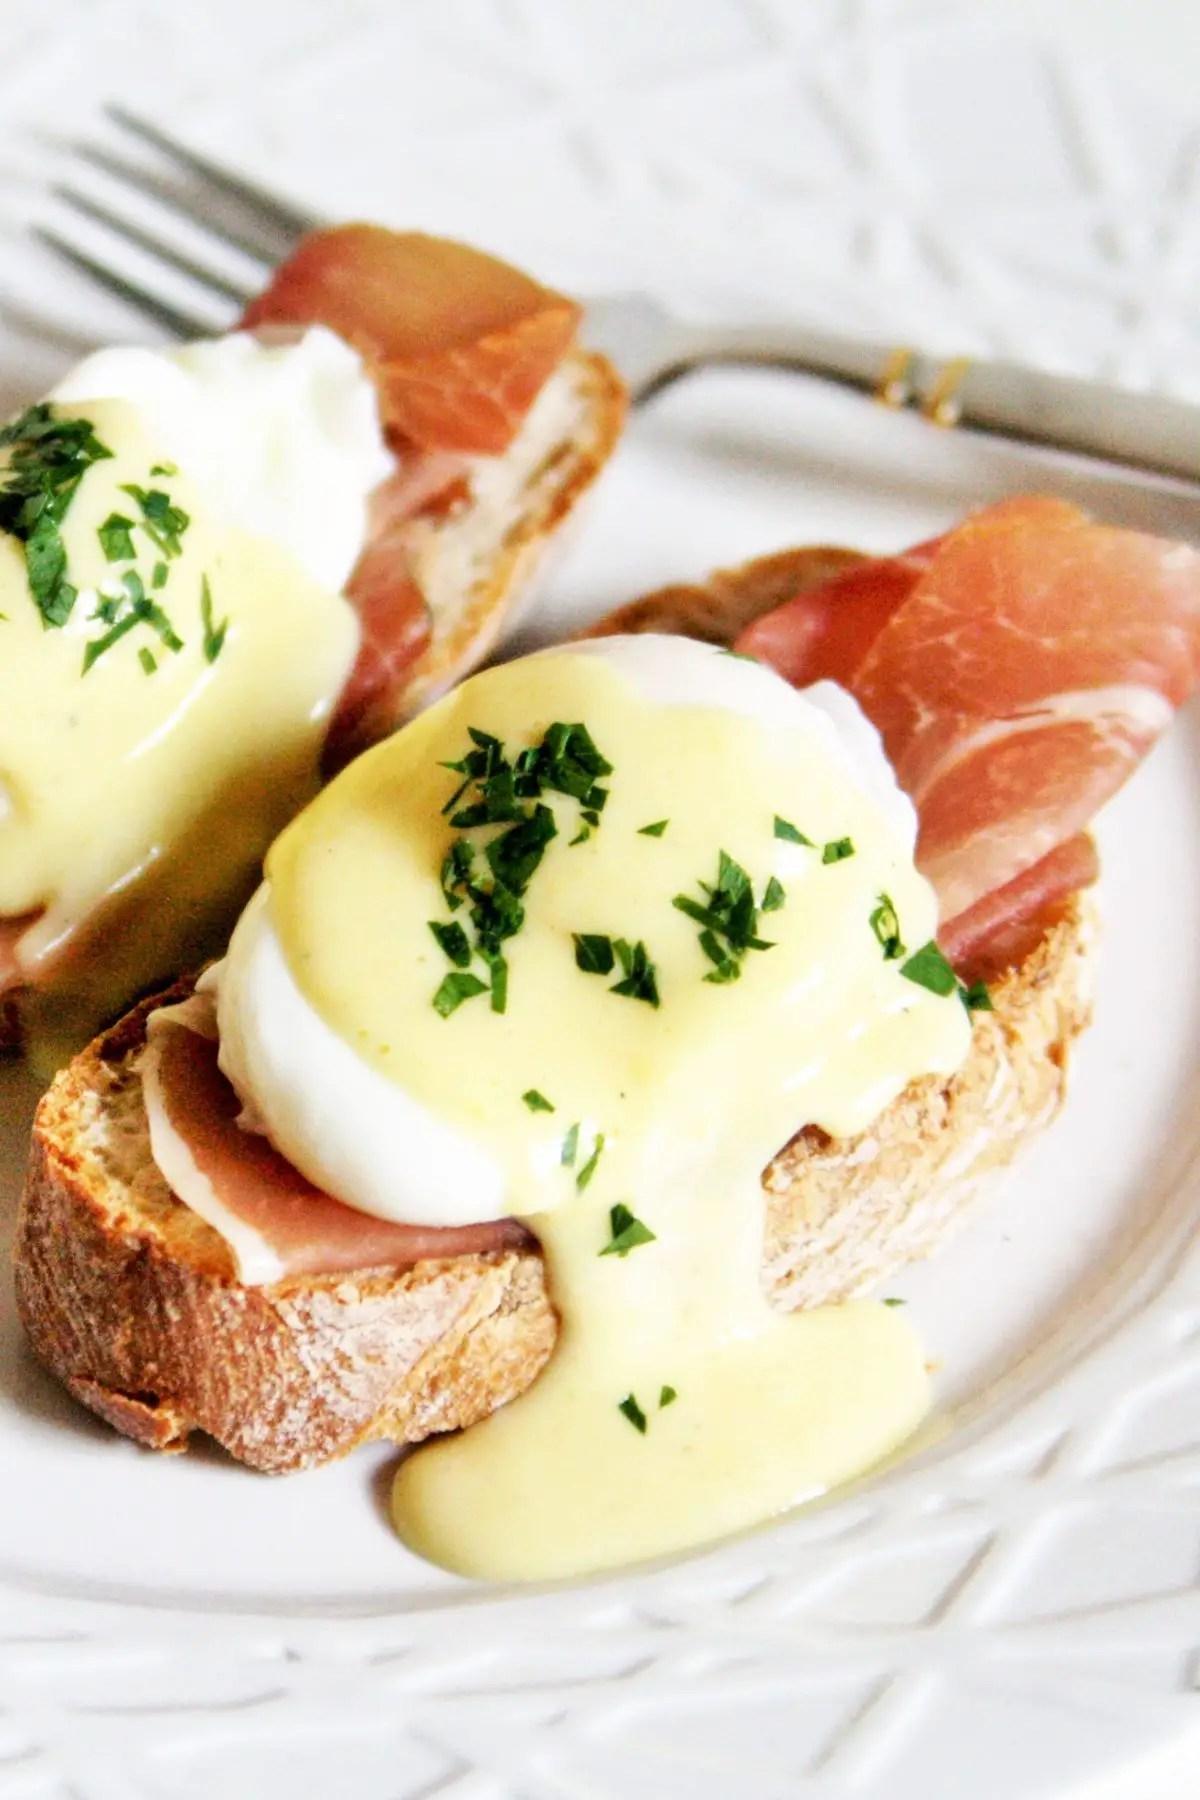 Eggs Benedict With Horseradish Hollandaise Sauce The Tasty Bite